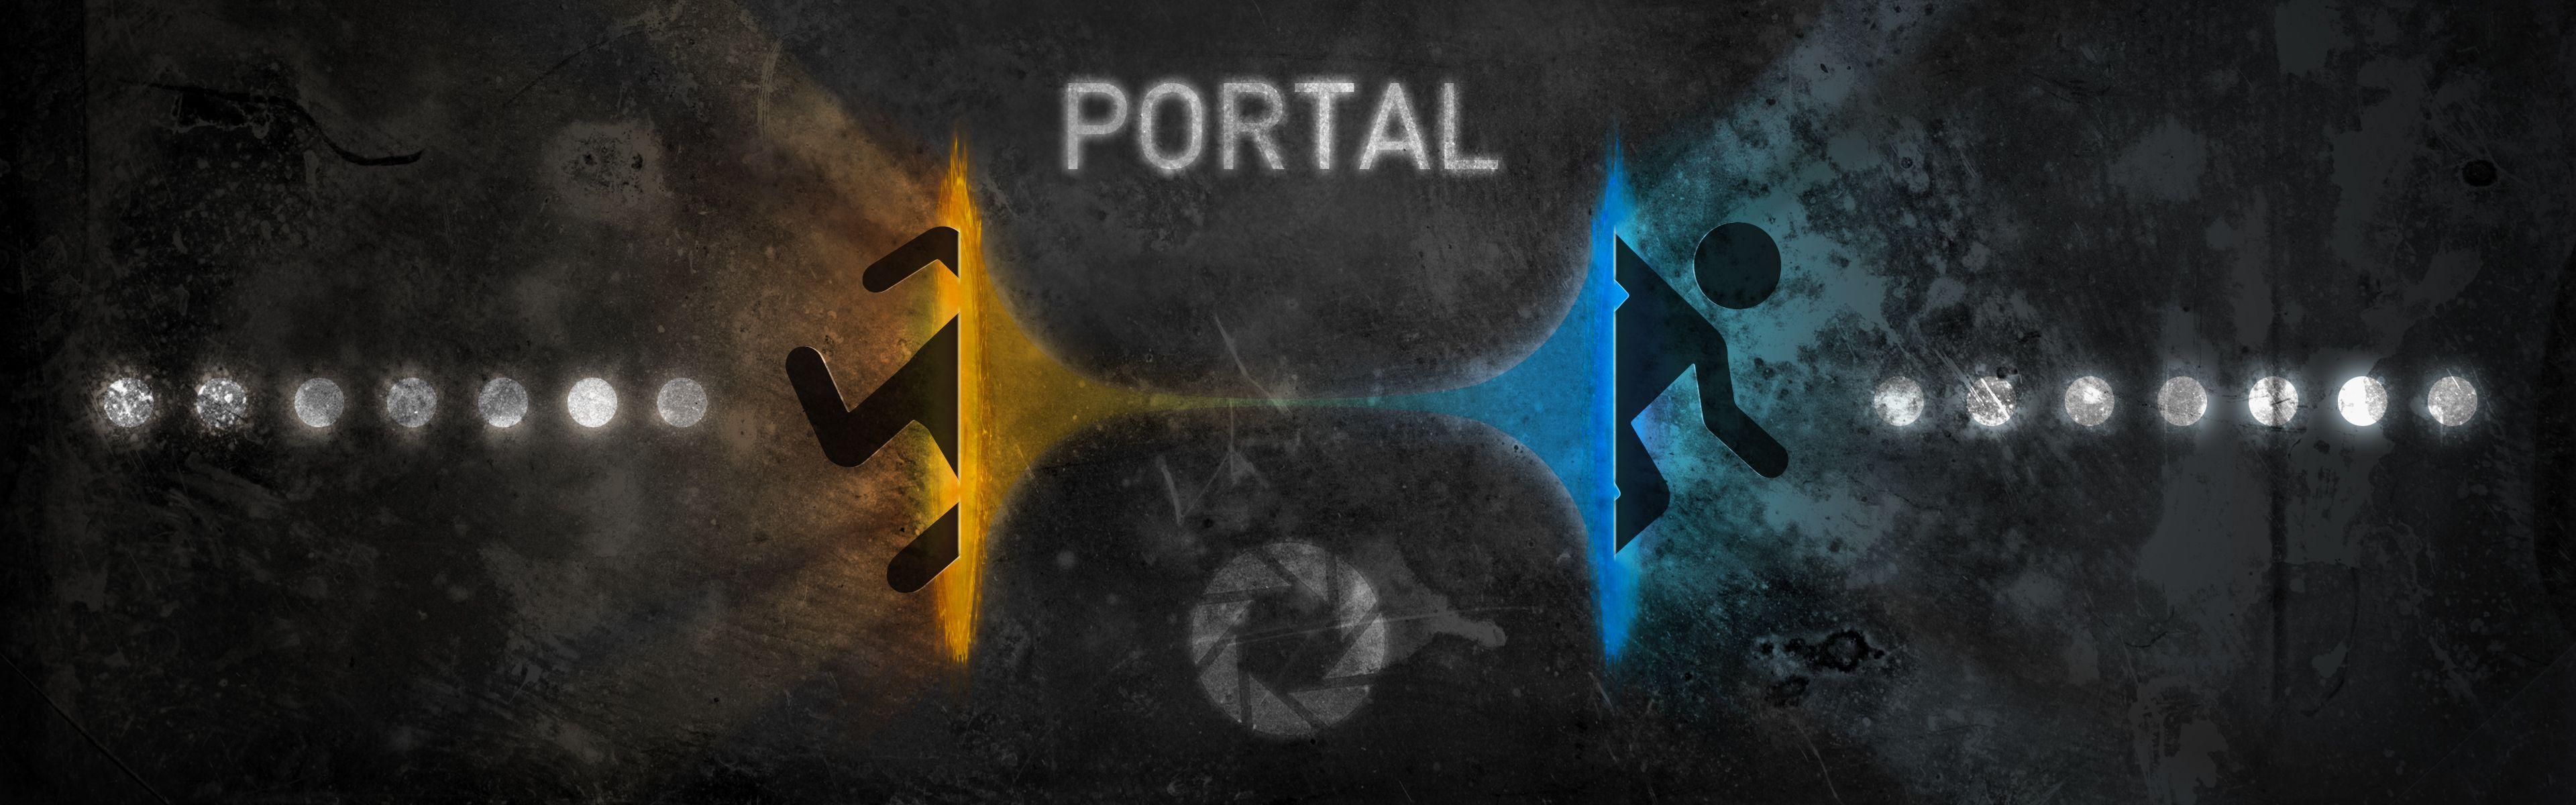 portal 2 wallpaper dual - photo #1